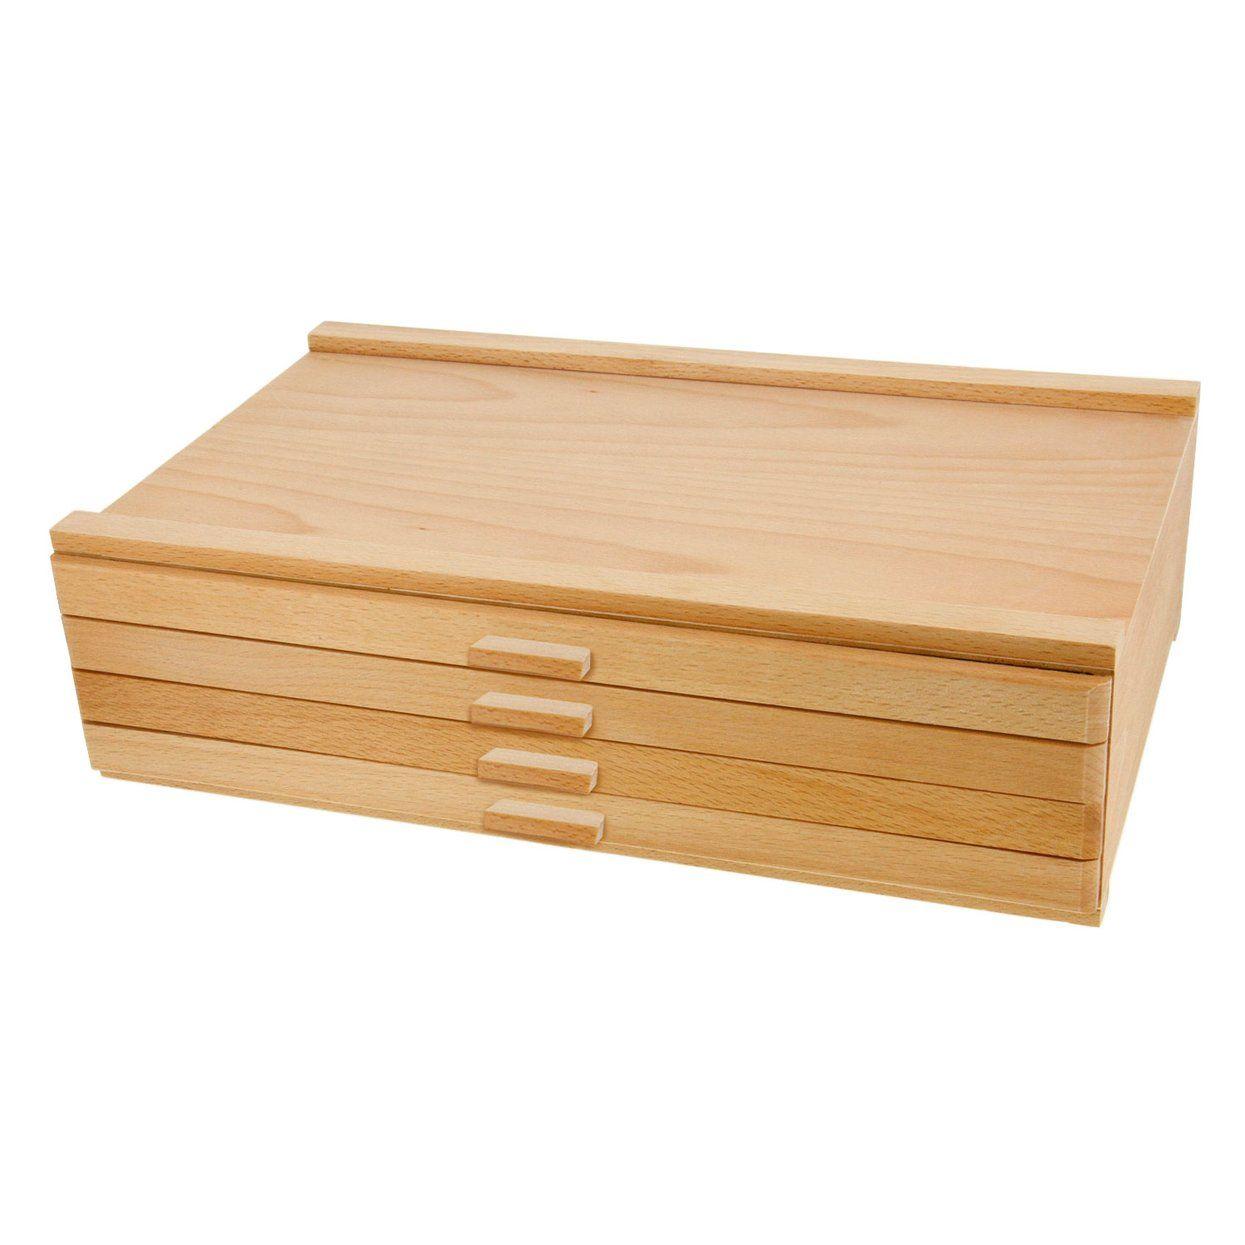 4 Drawer Artist Wood Pastel Pen Marker Storage Box